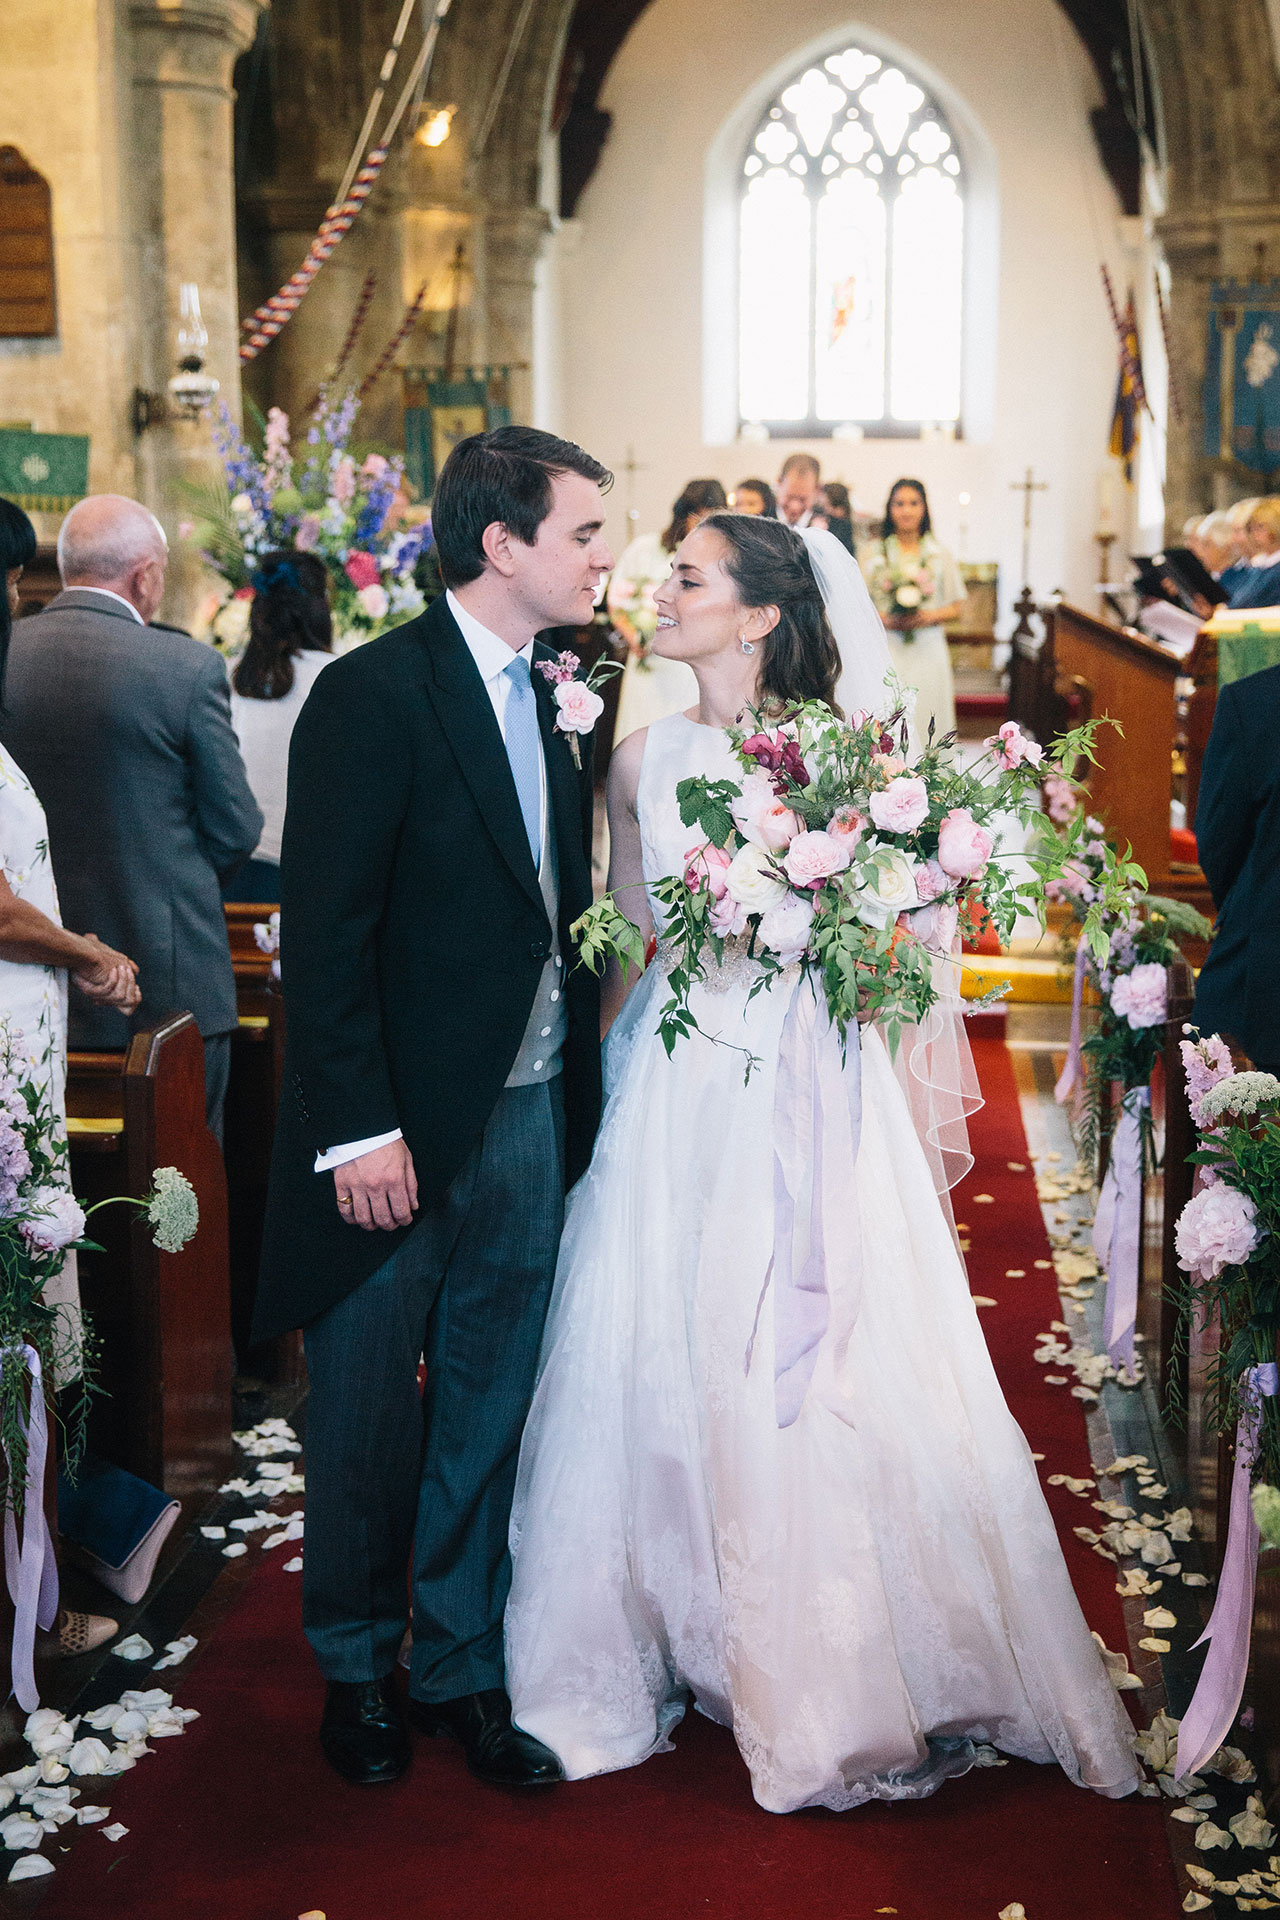 Langar-Hall-wedding-photographer-in-Nottinghamshire-Michael-Newington-Gray-42.jpg